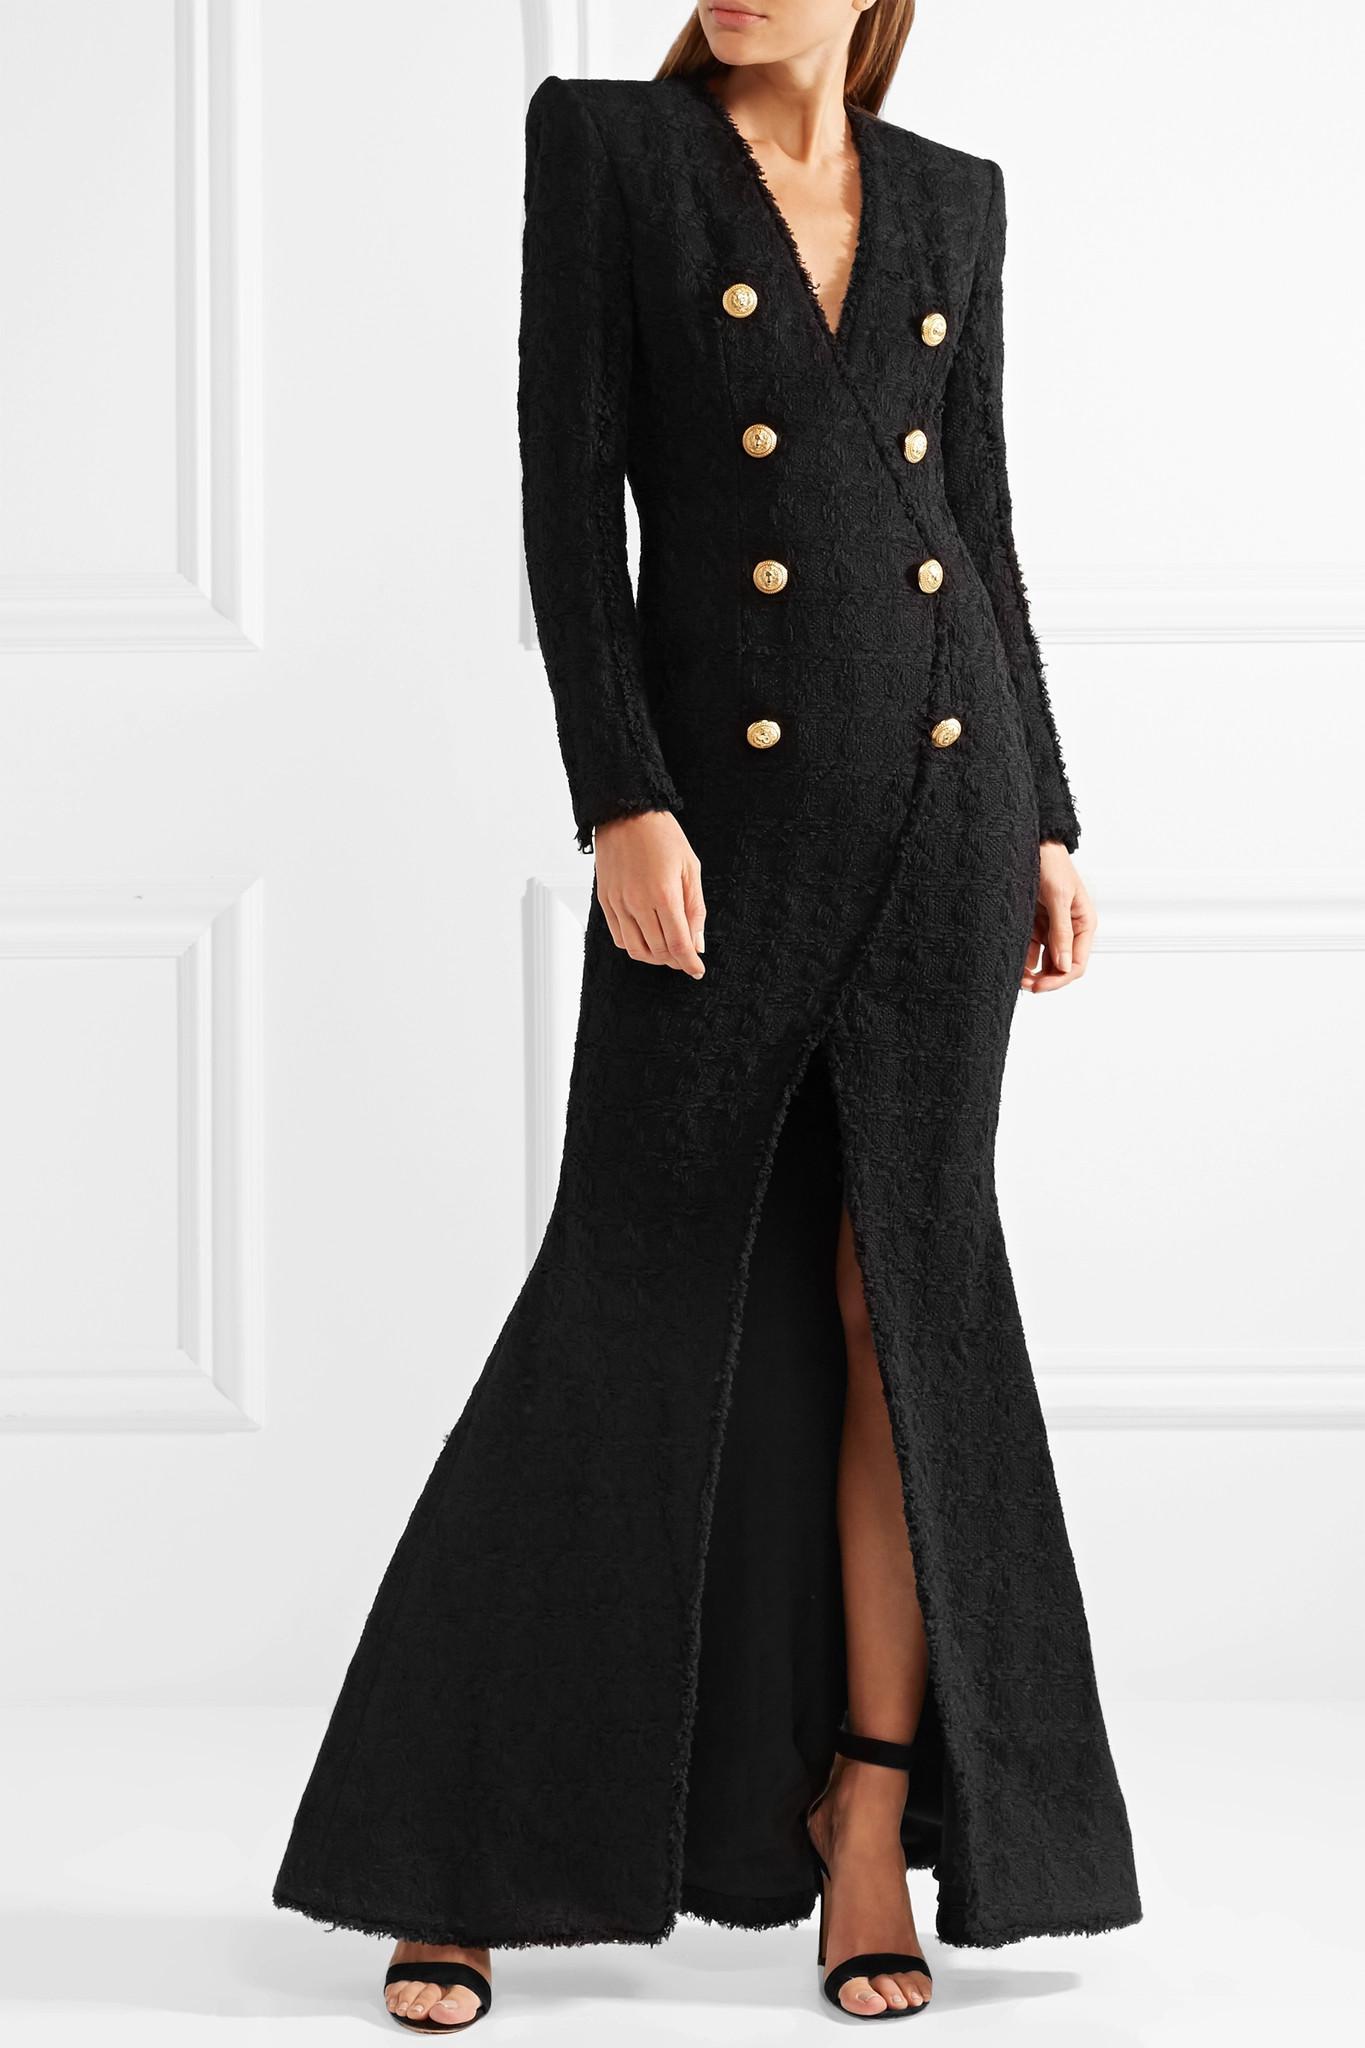 Button-embellished Tweed Gown - Black Balmain wPIzMv